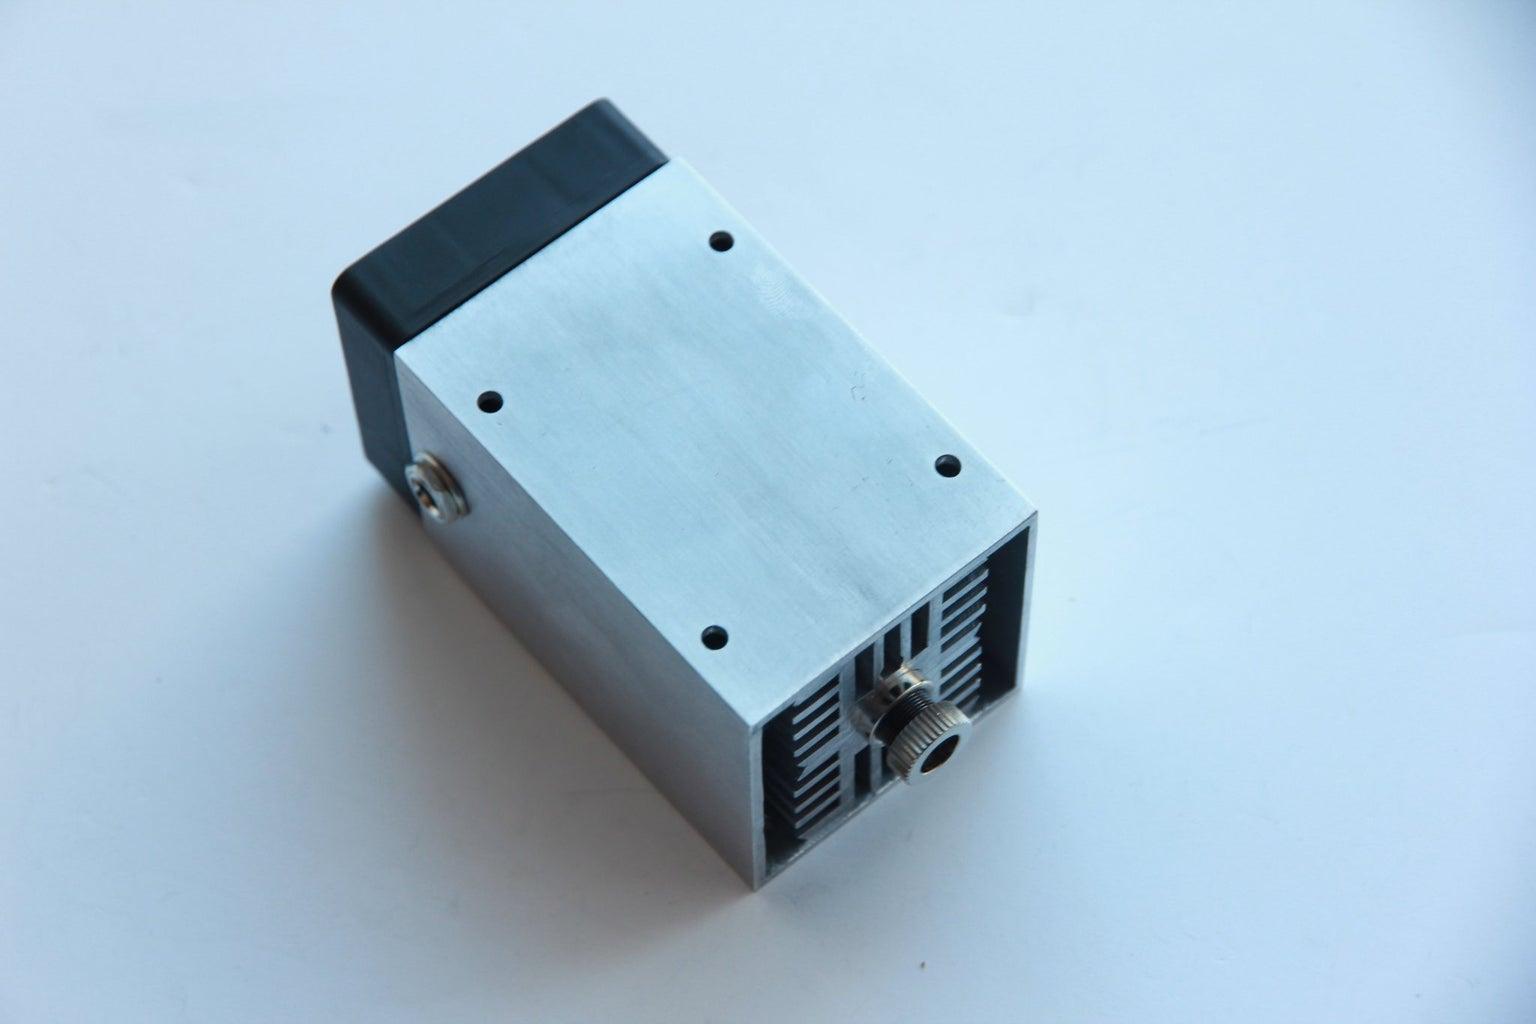 Assembling an Endurance 10w Laser Kit